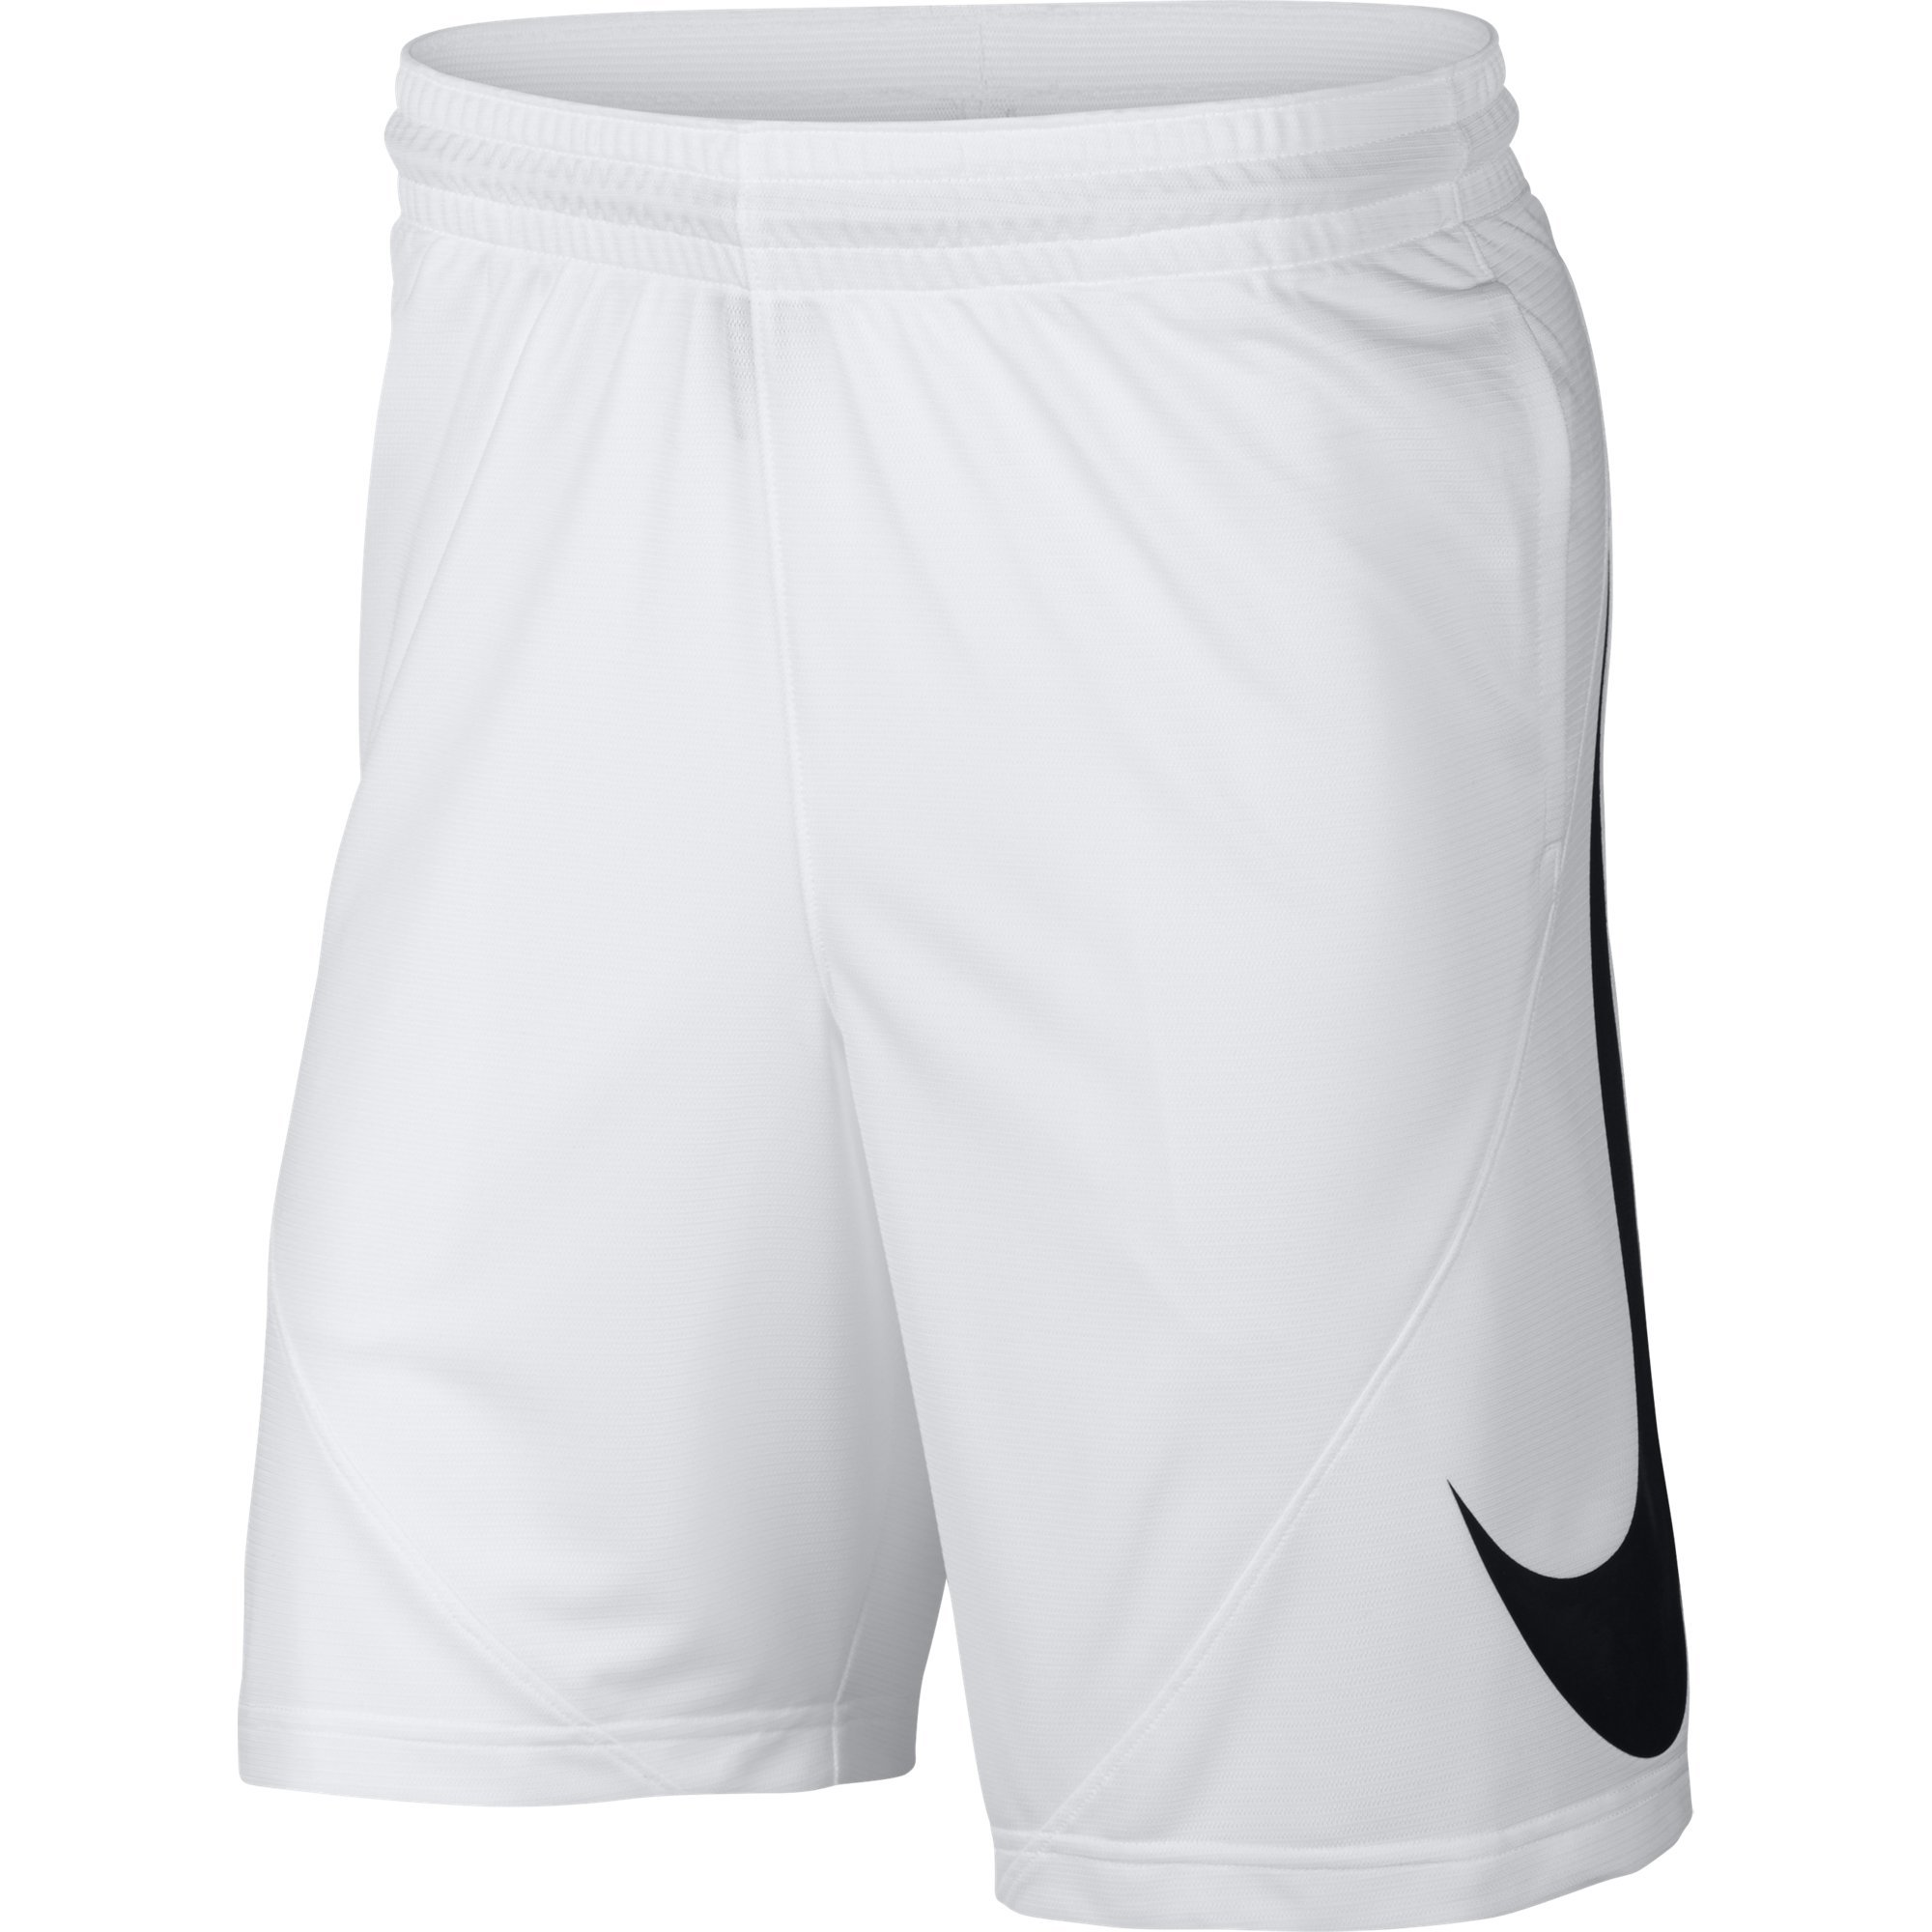 NIKE Men's HBR Basketball Shorts, White/White/Black, Small